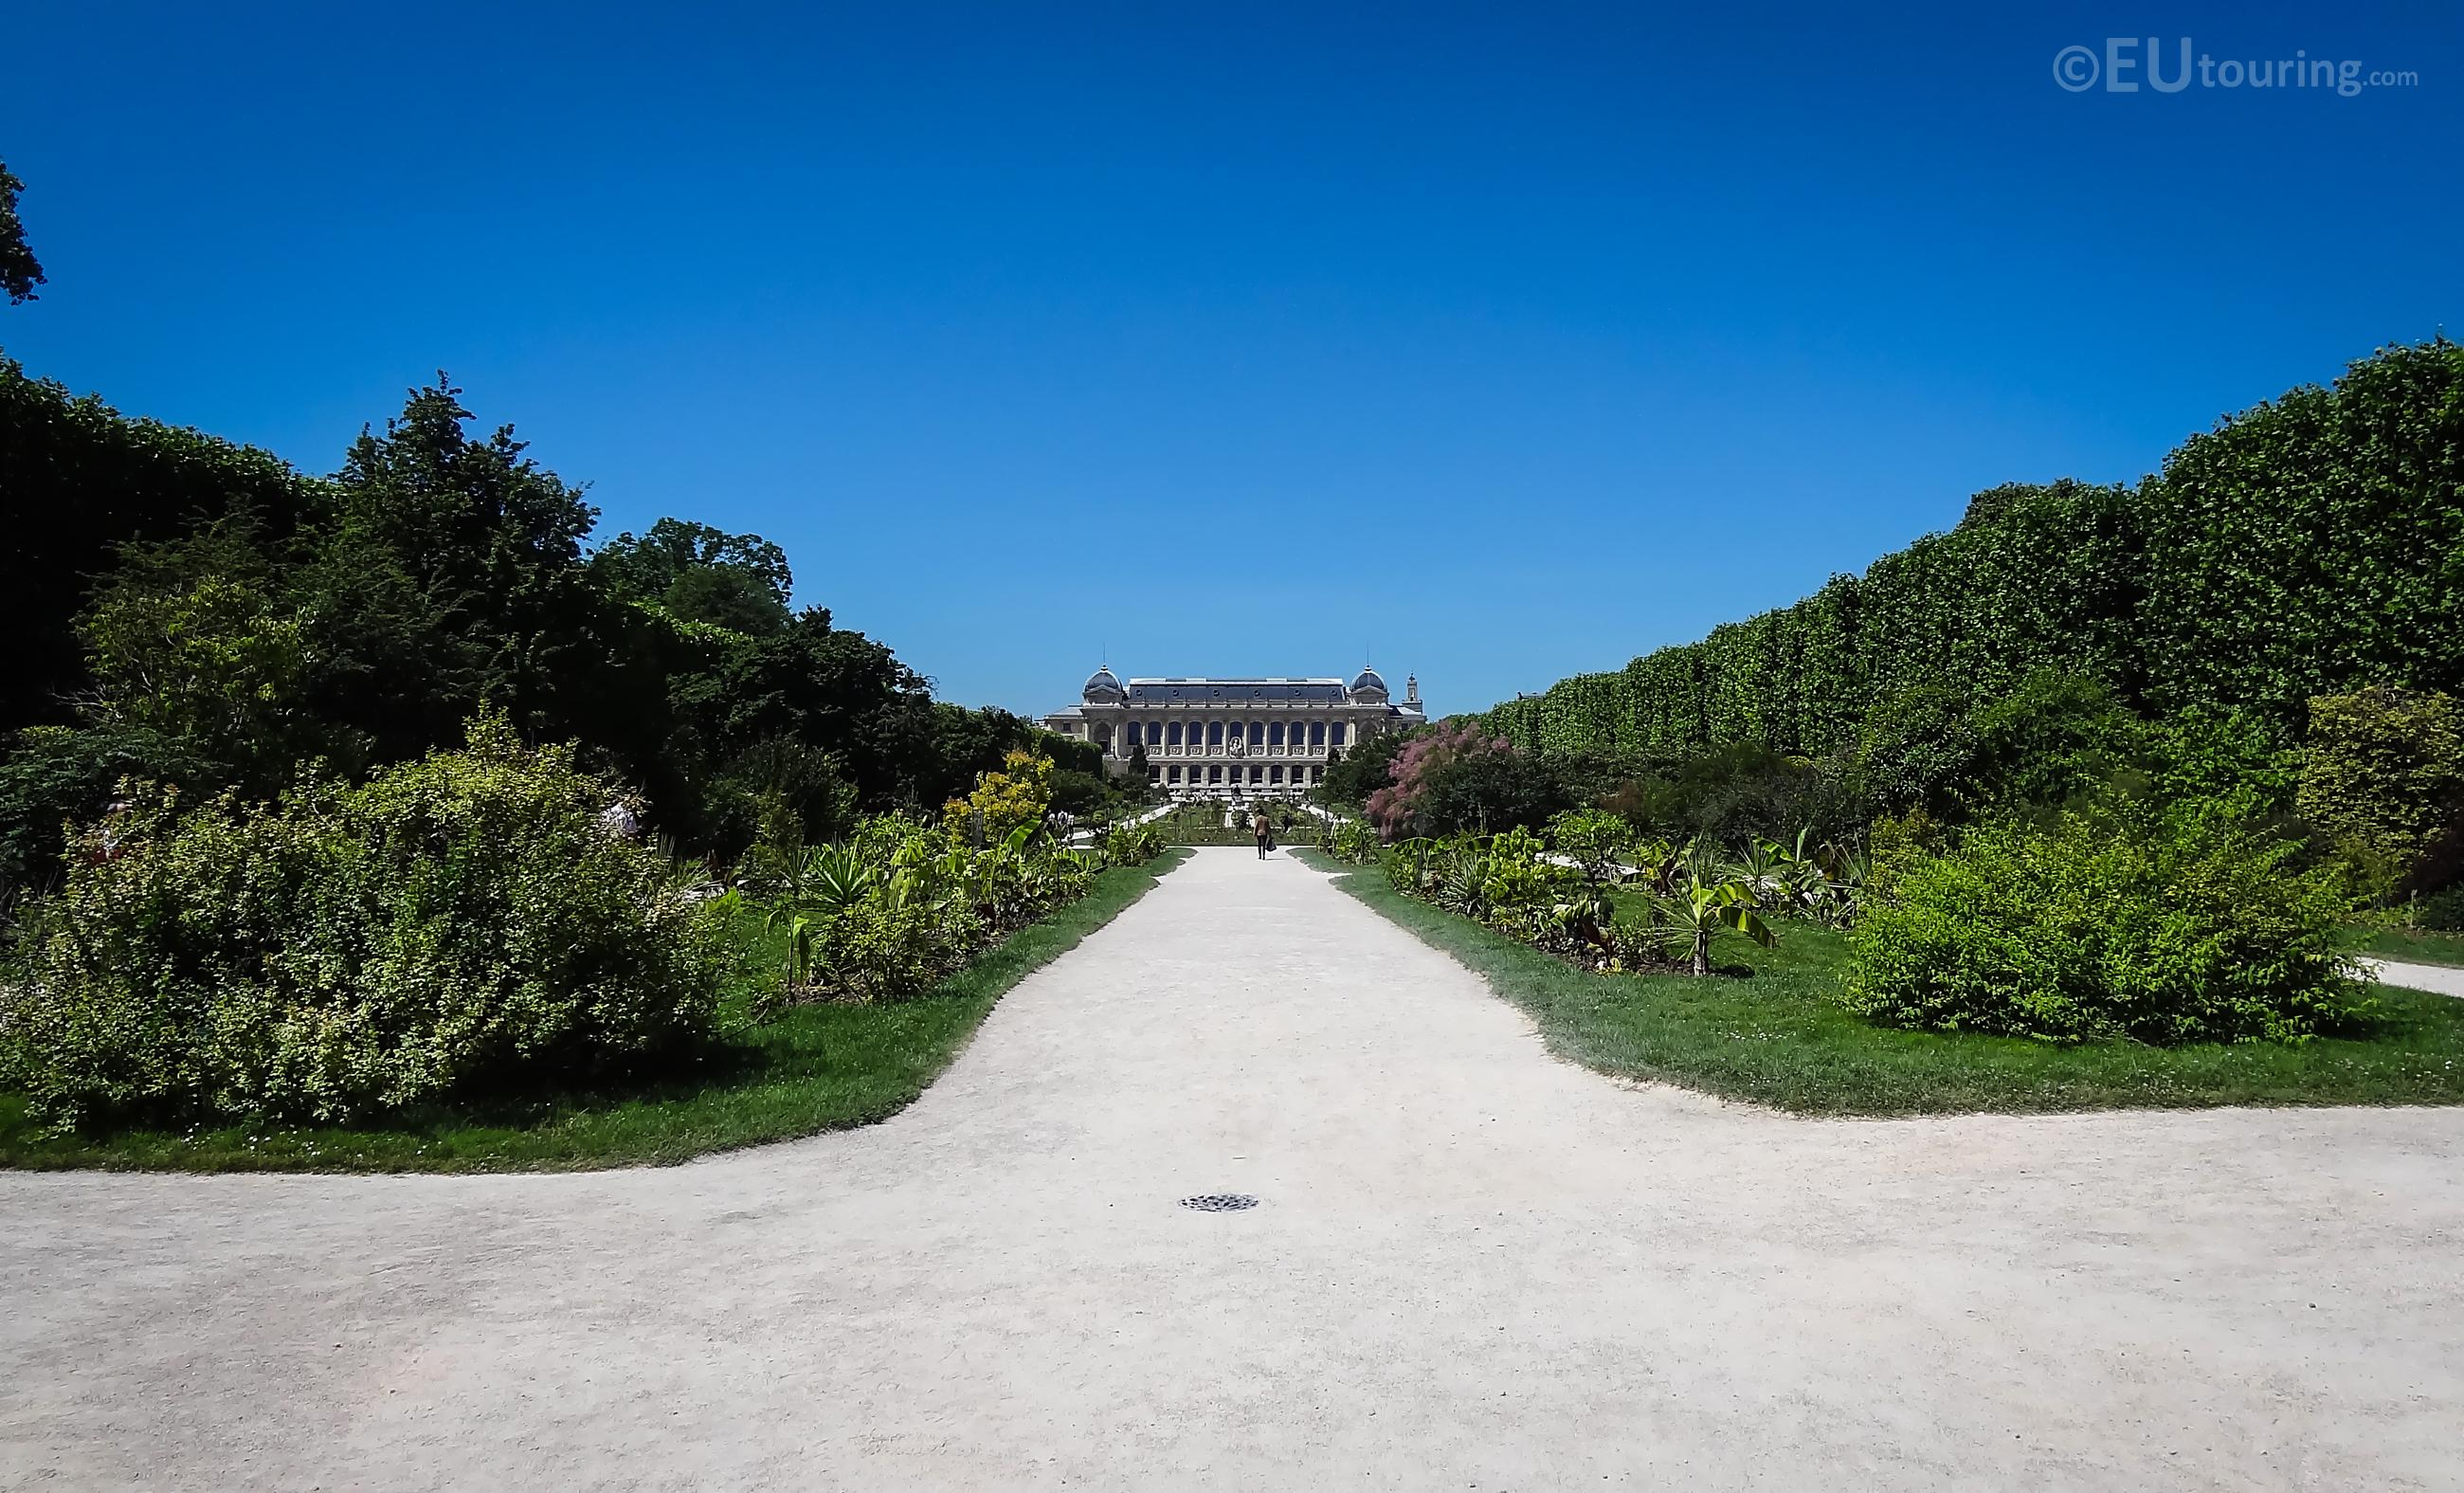 Grande Galerie de l'Evolution within Jardin des Plantes